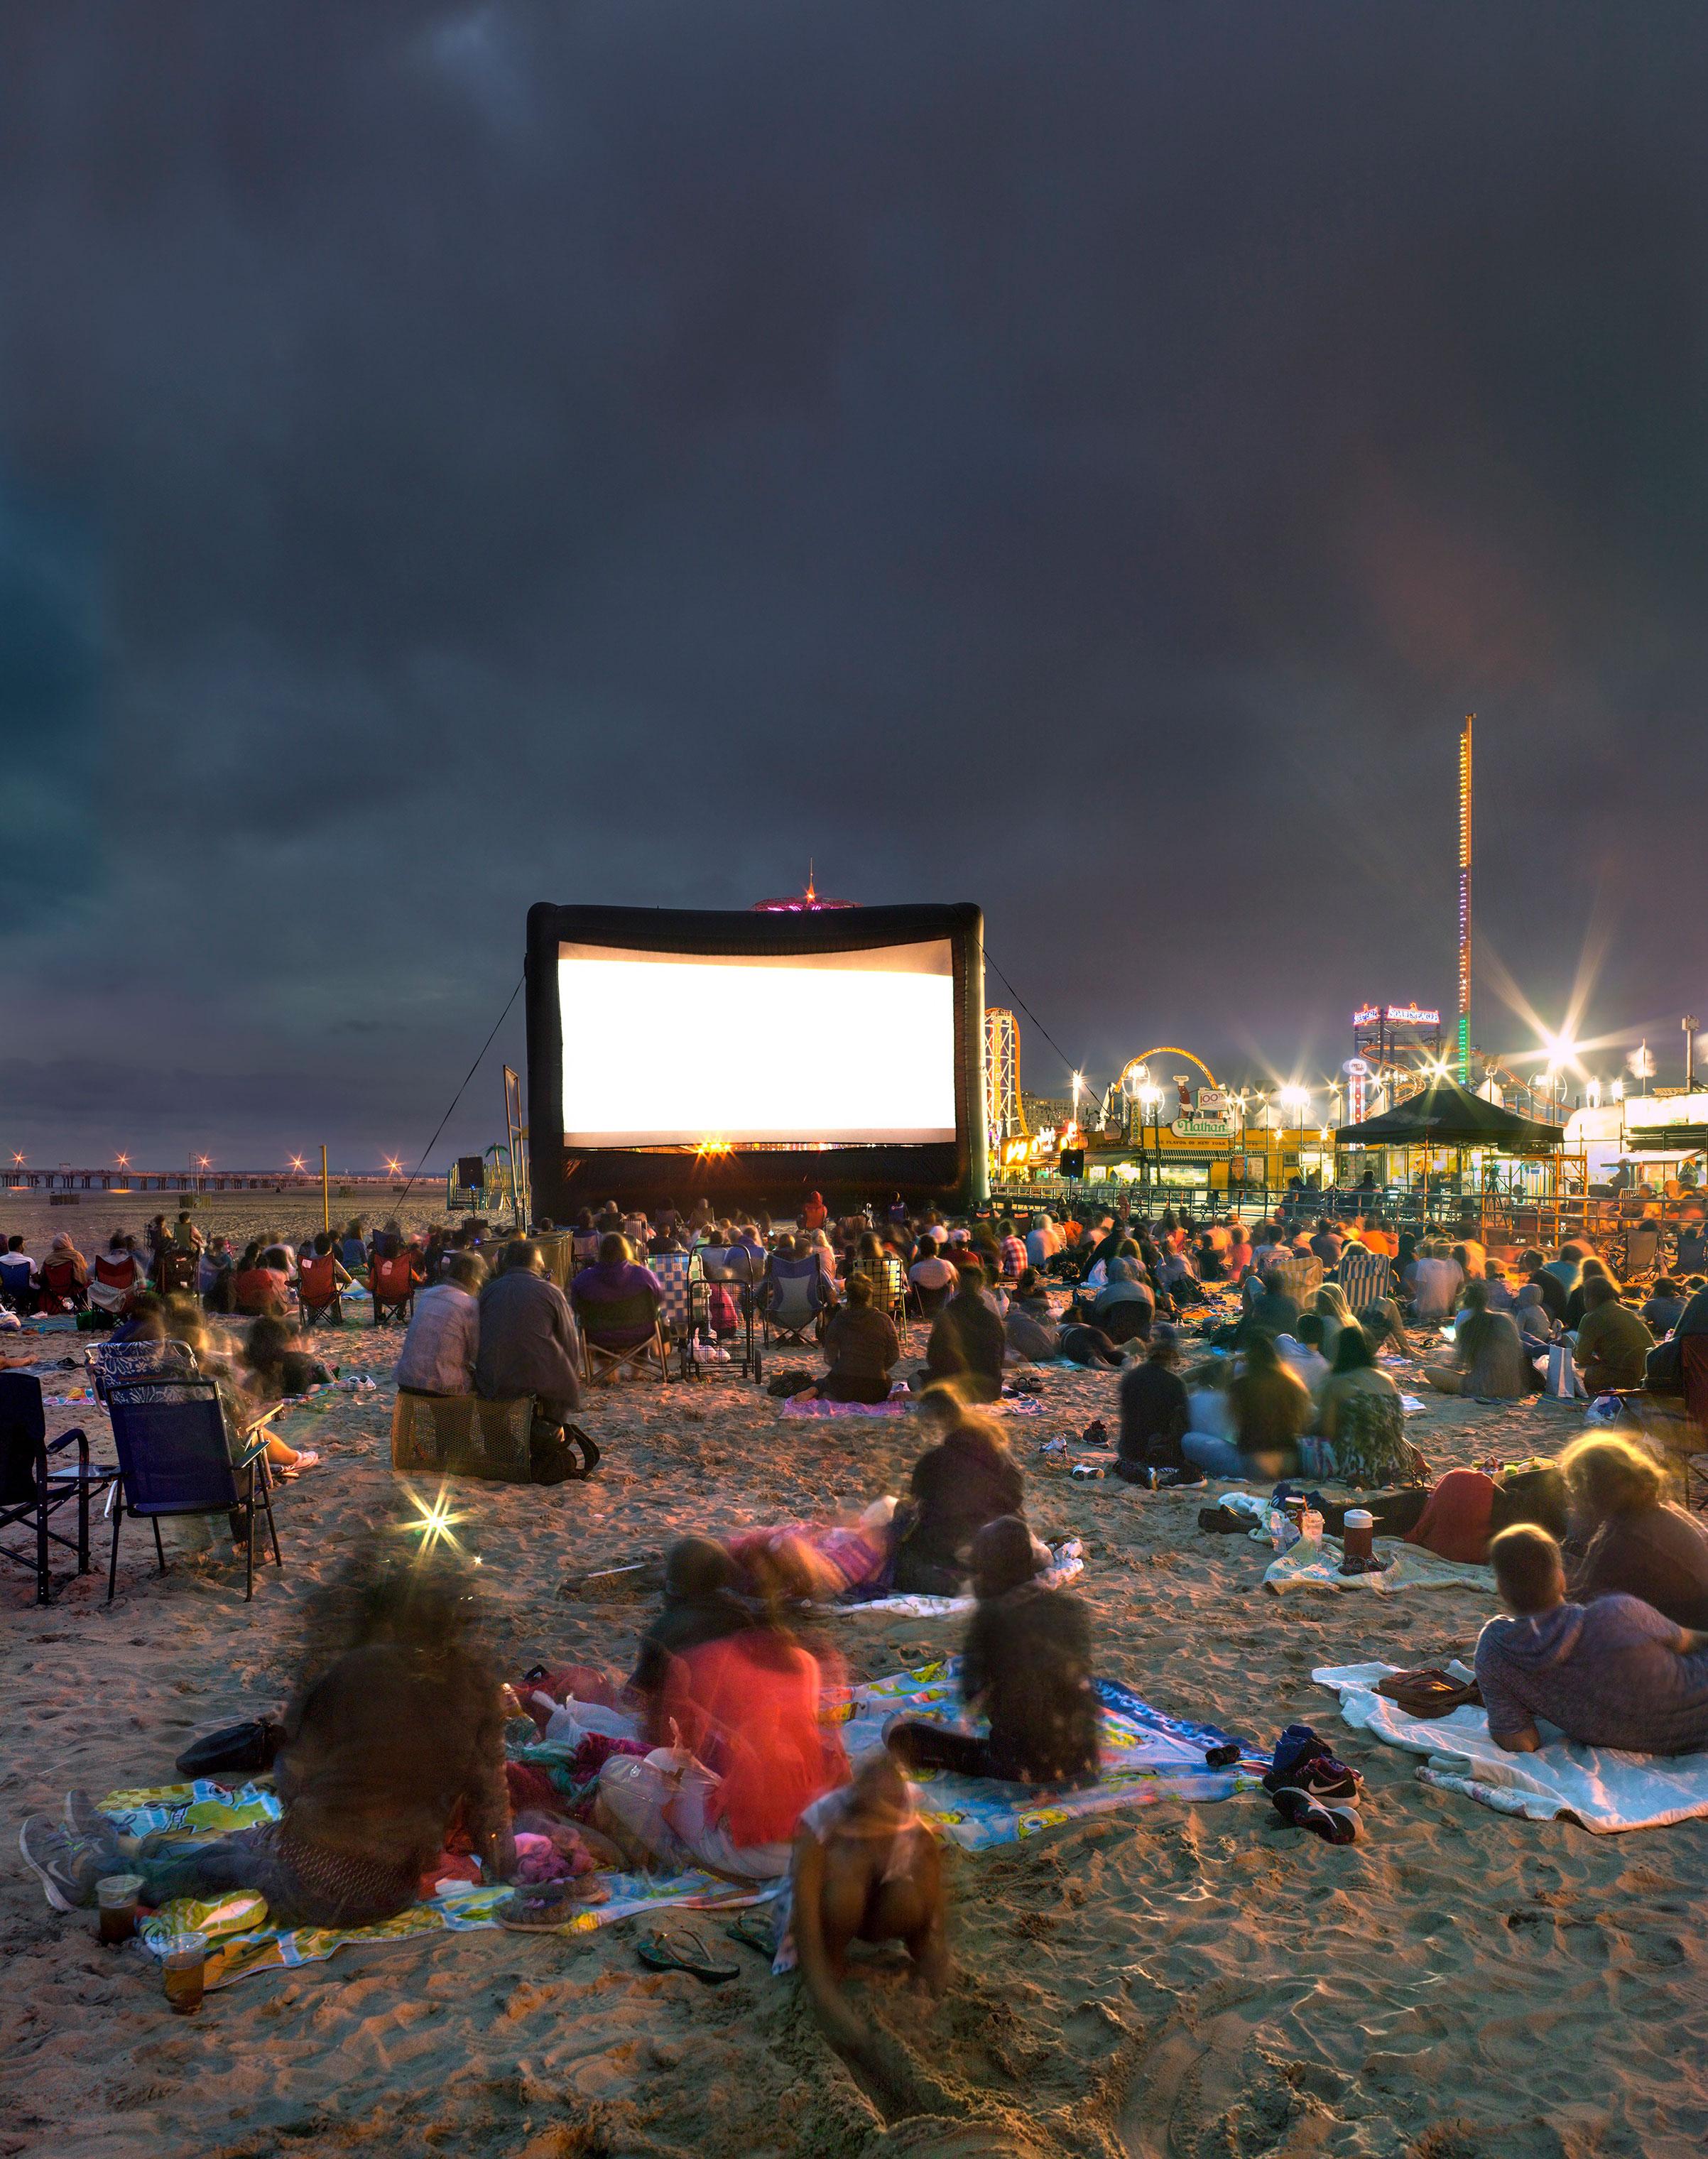 Moviegoers and Coney Island beach and boardwalk, 2016.